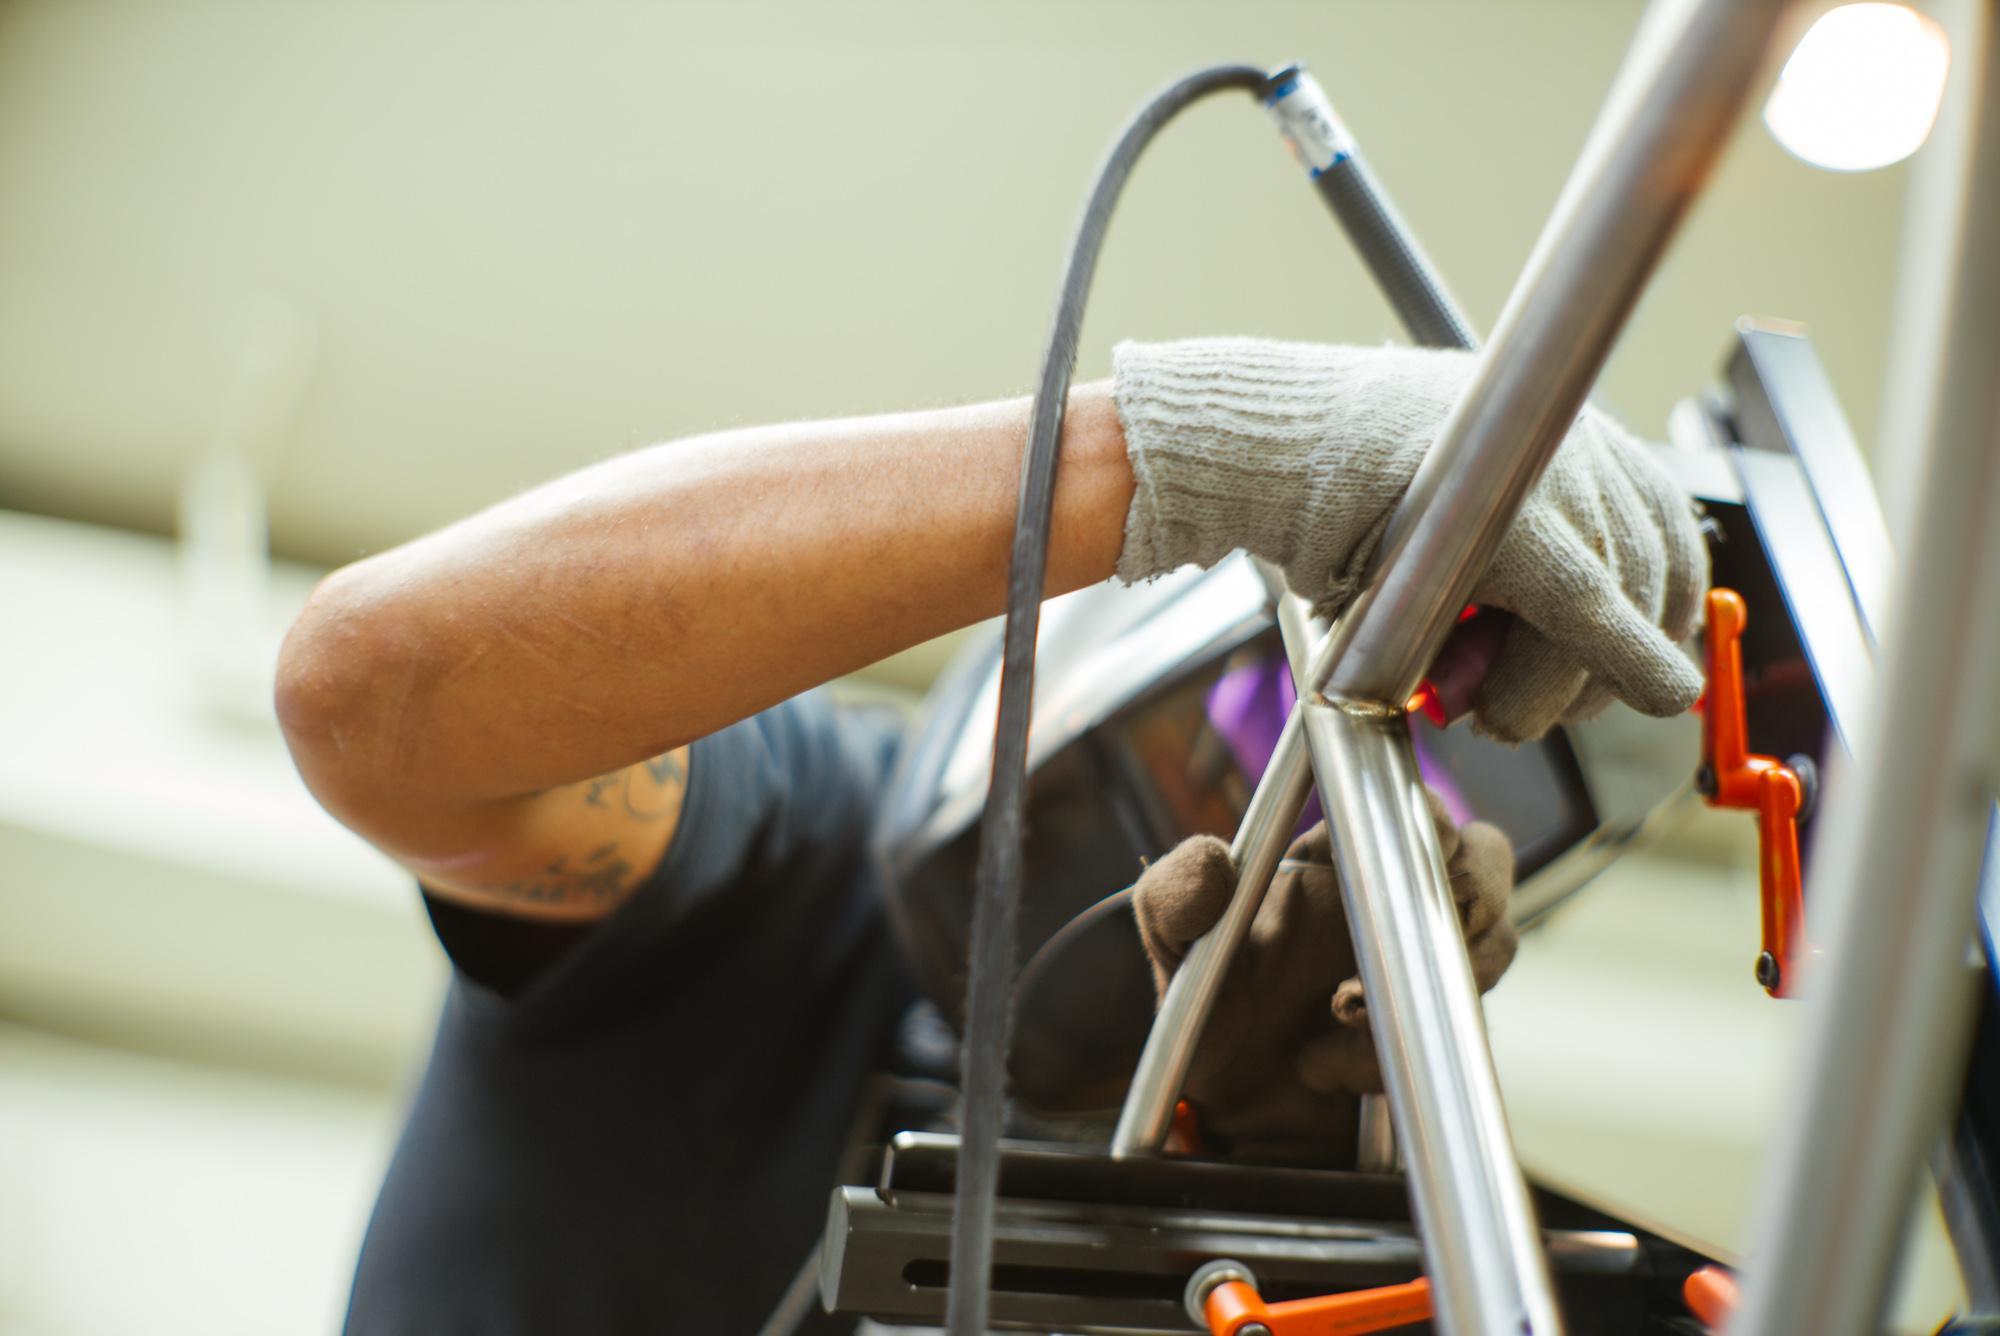 Carlos welding